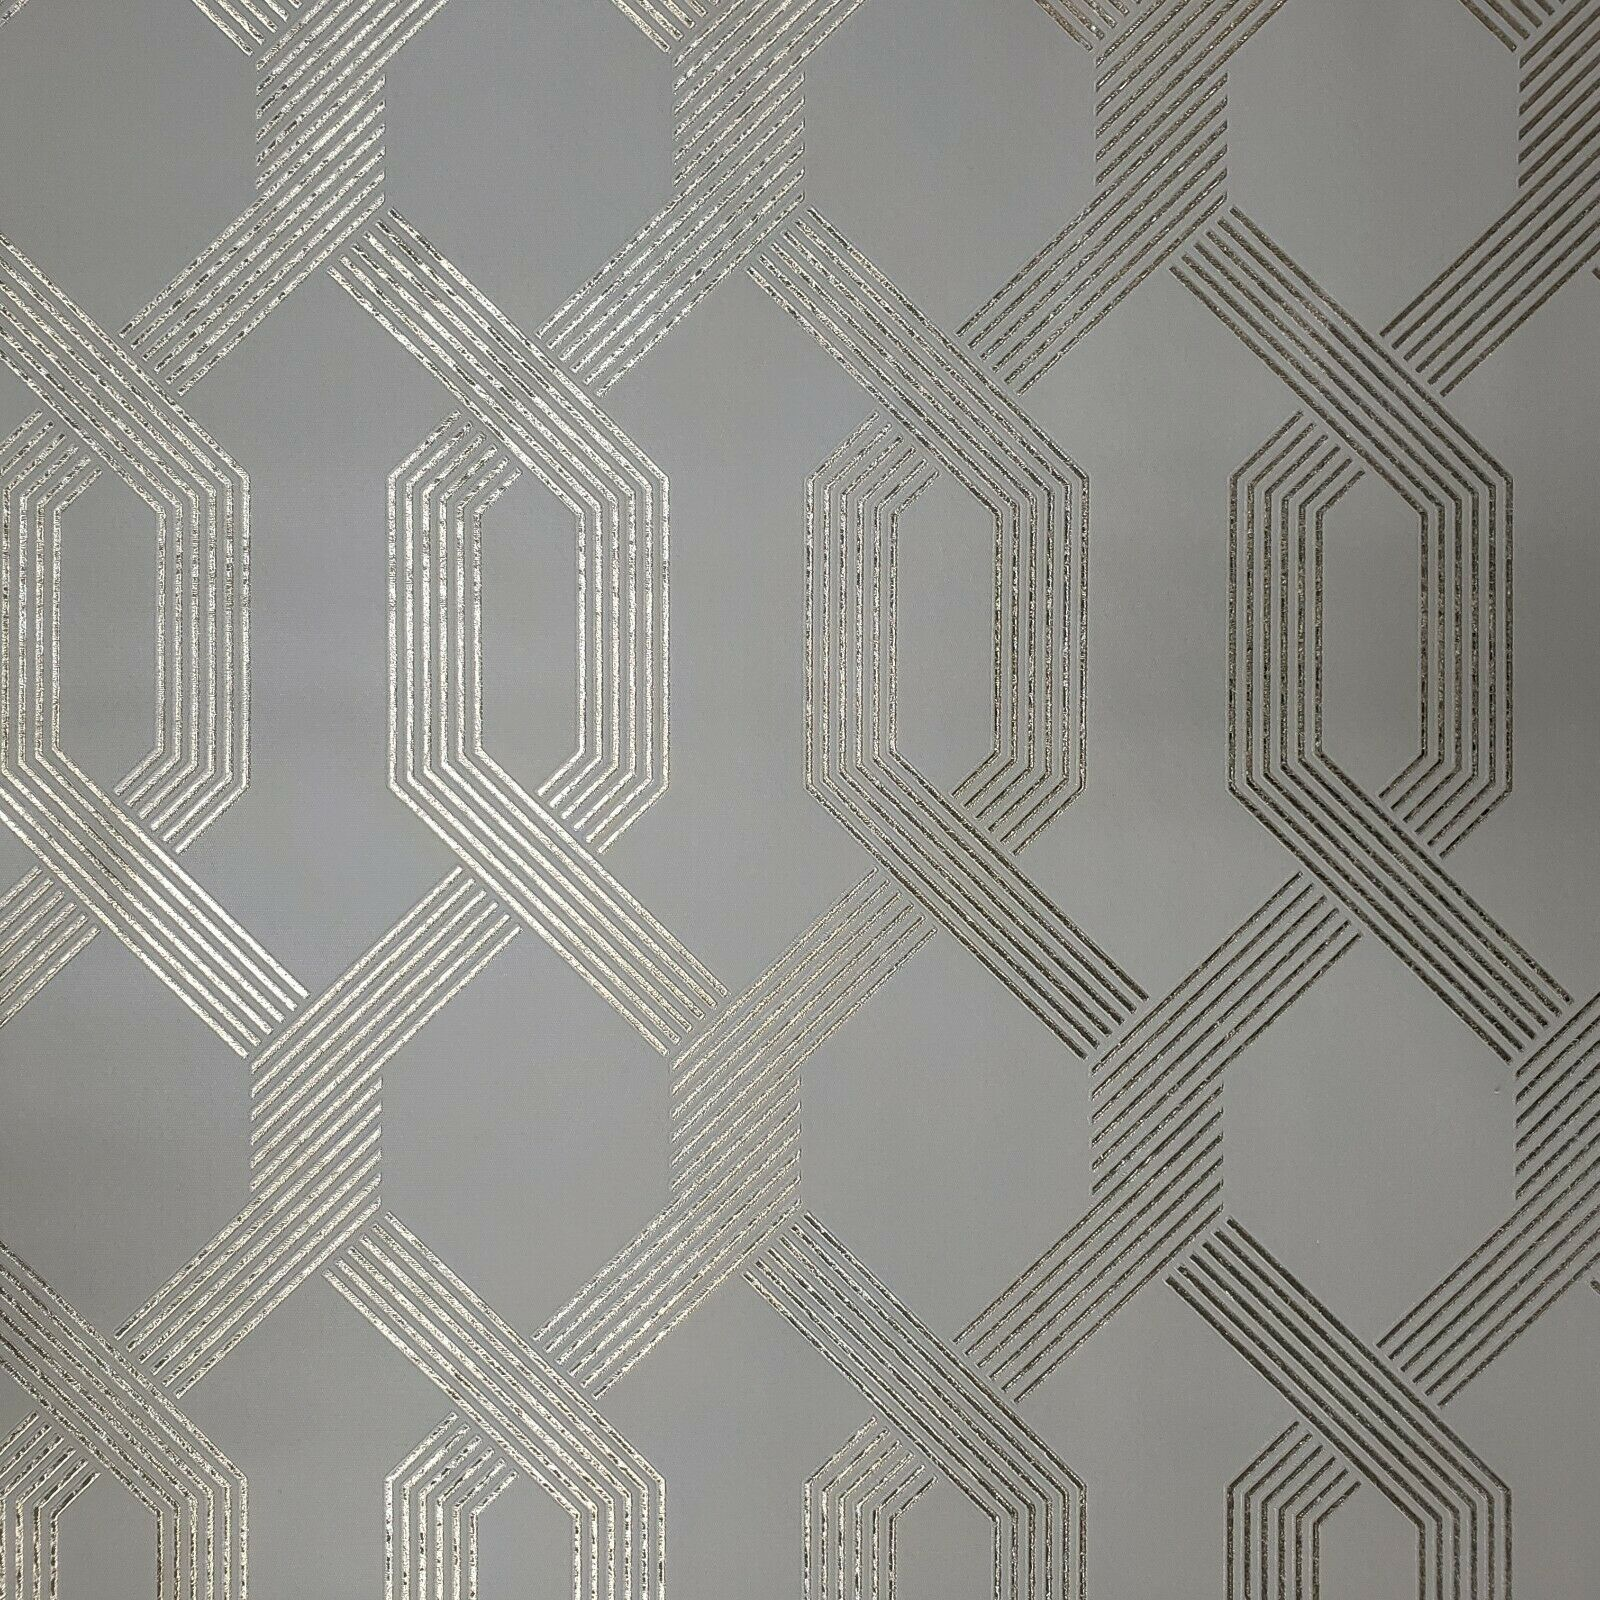 Details About Y6221205 Viva Lounge York Mid Century Contemporary Dark Beige Gold Wallpaper 3d Gold Wallpaper Geometric Shapes Wallpaper Contemporary Geometric Wallpaper